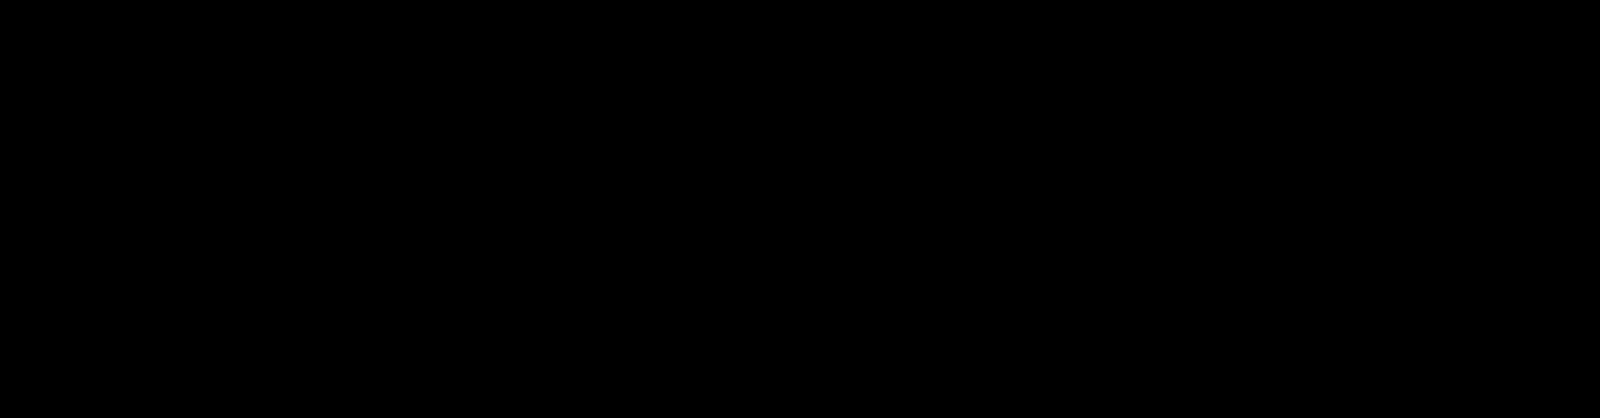 Brandless Logo